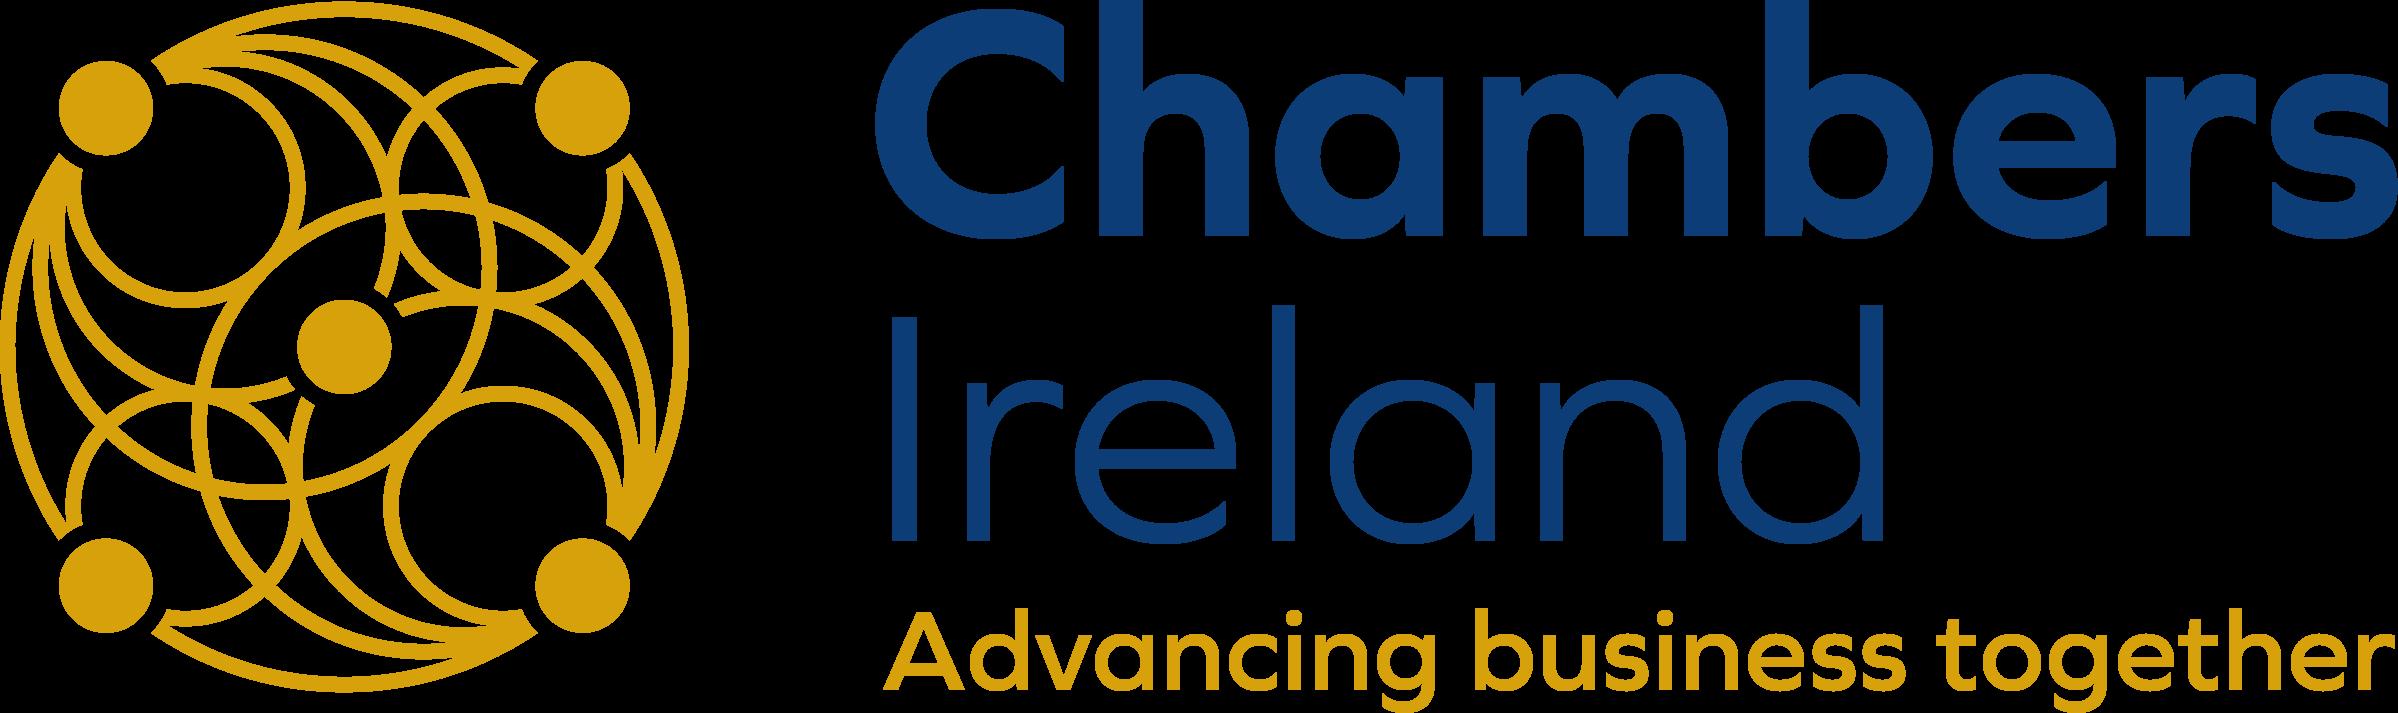 Chambers-Ireland-Tagline